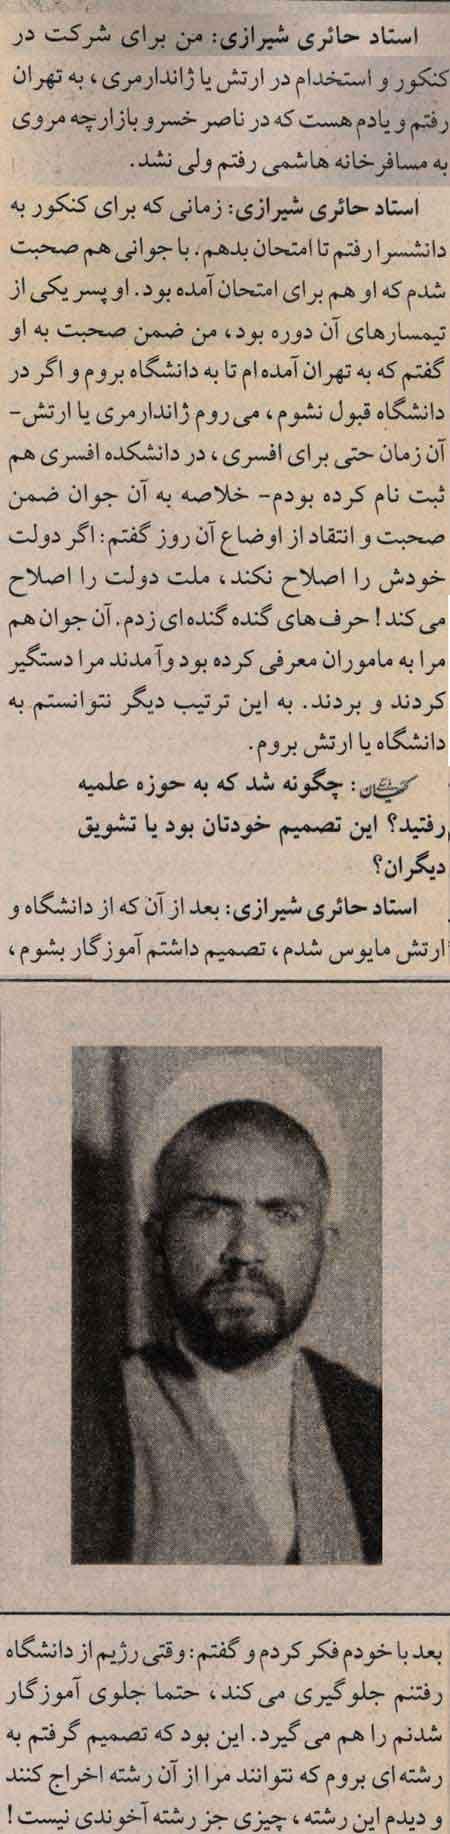 https://i2.wp.com/www.shahbazi.org/images/Freemasonry_Sassoons14.jpg